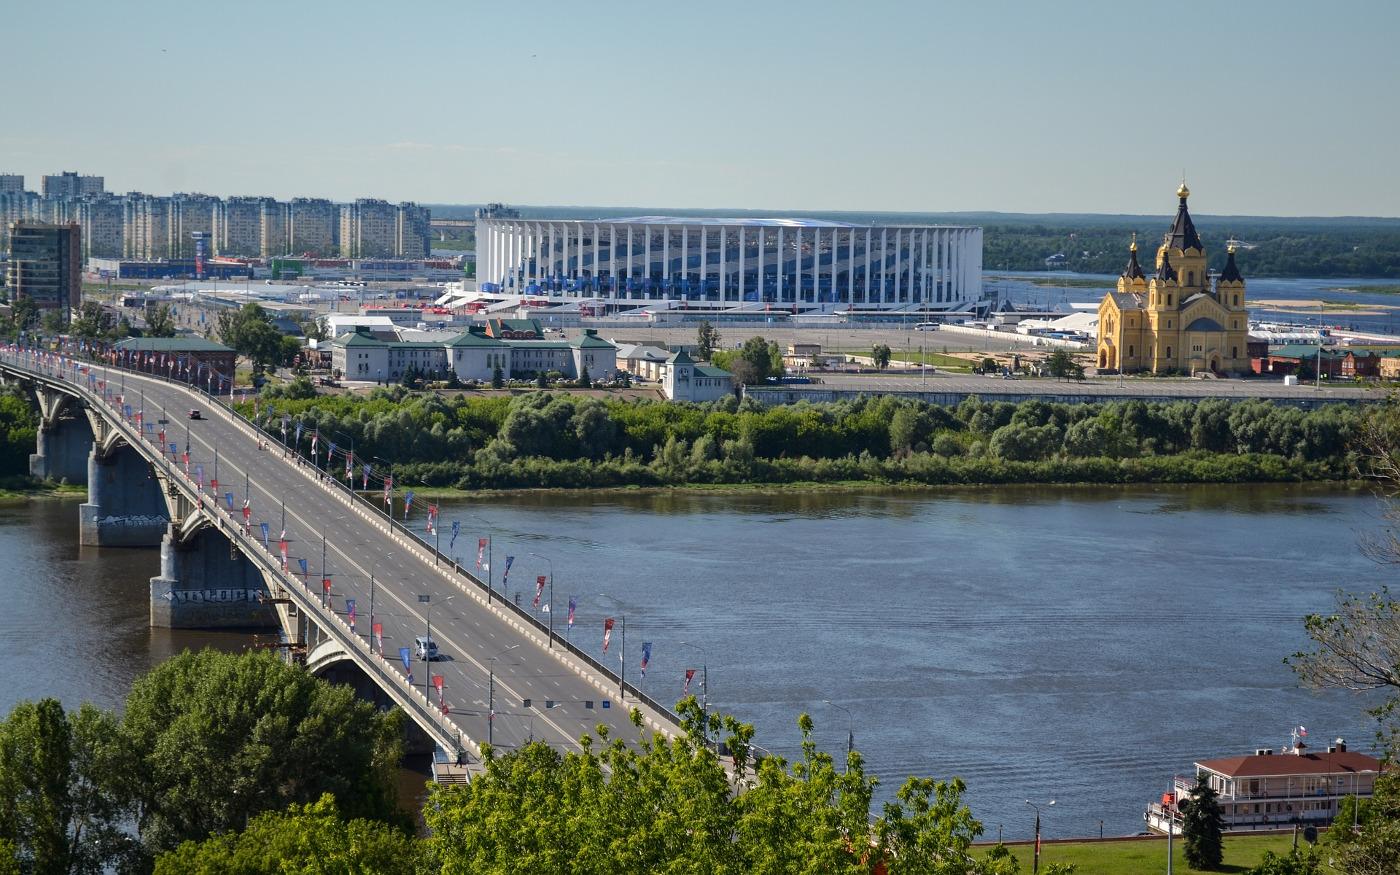 Brücke über die Wolga in Nischni Nowgorod